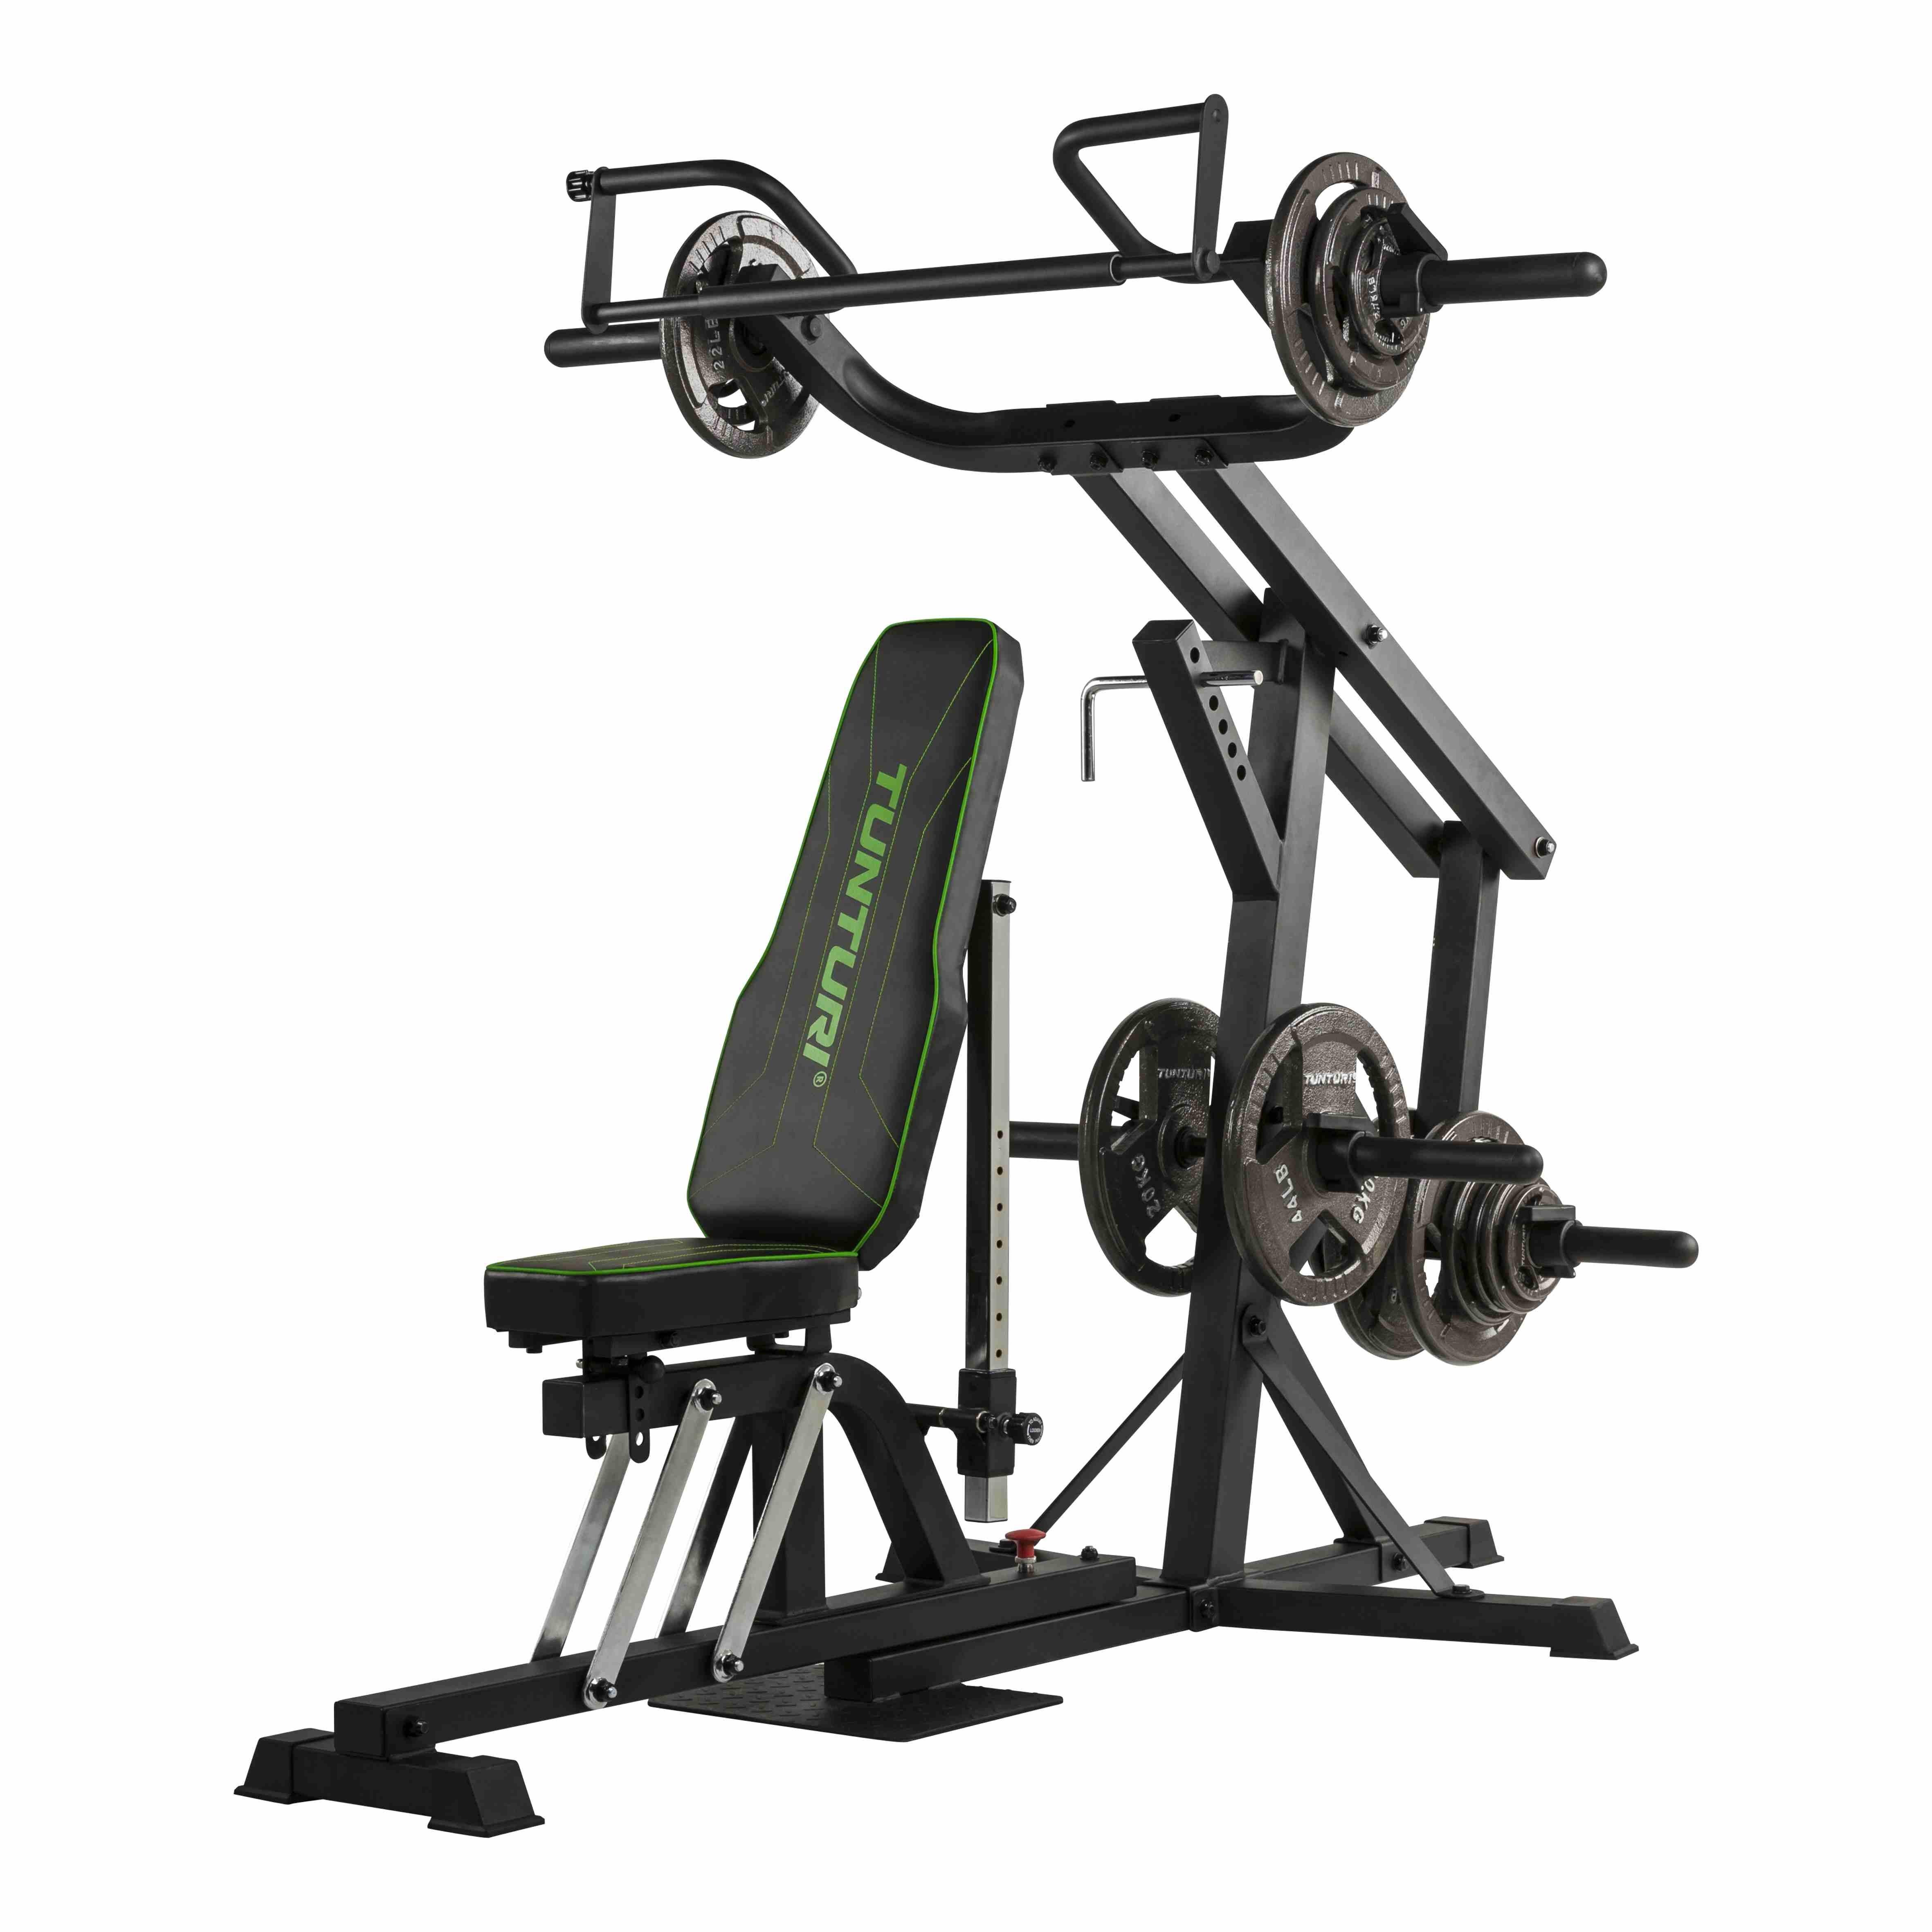 Leverage Gym WT80 Tunturi